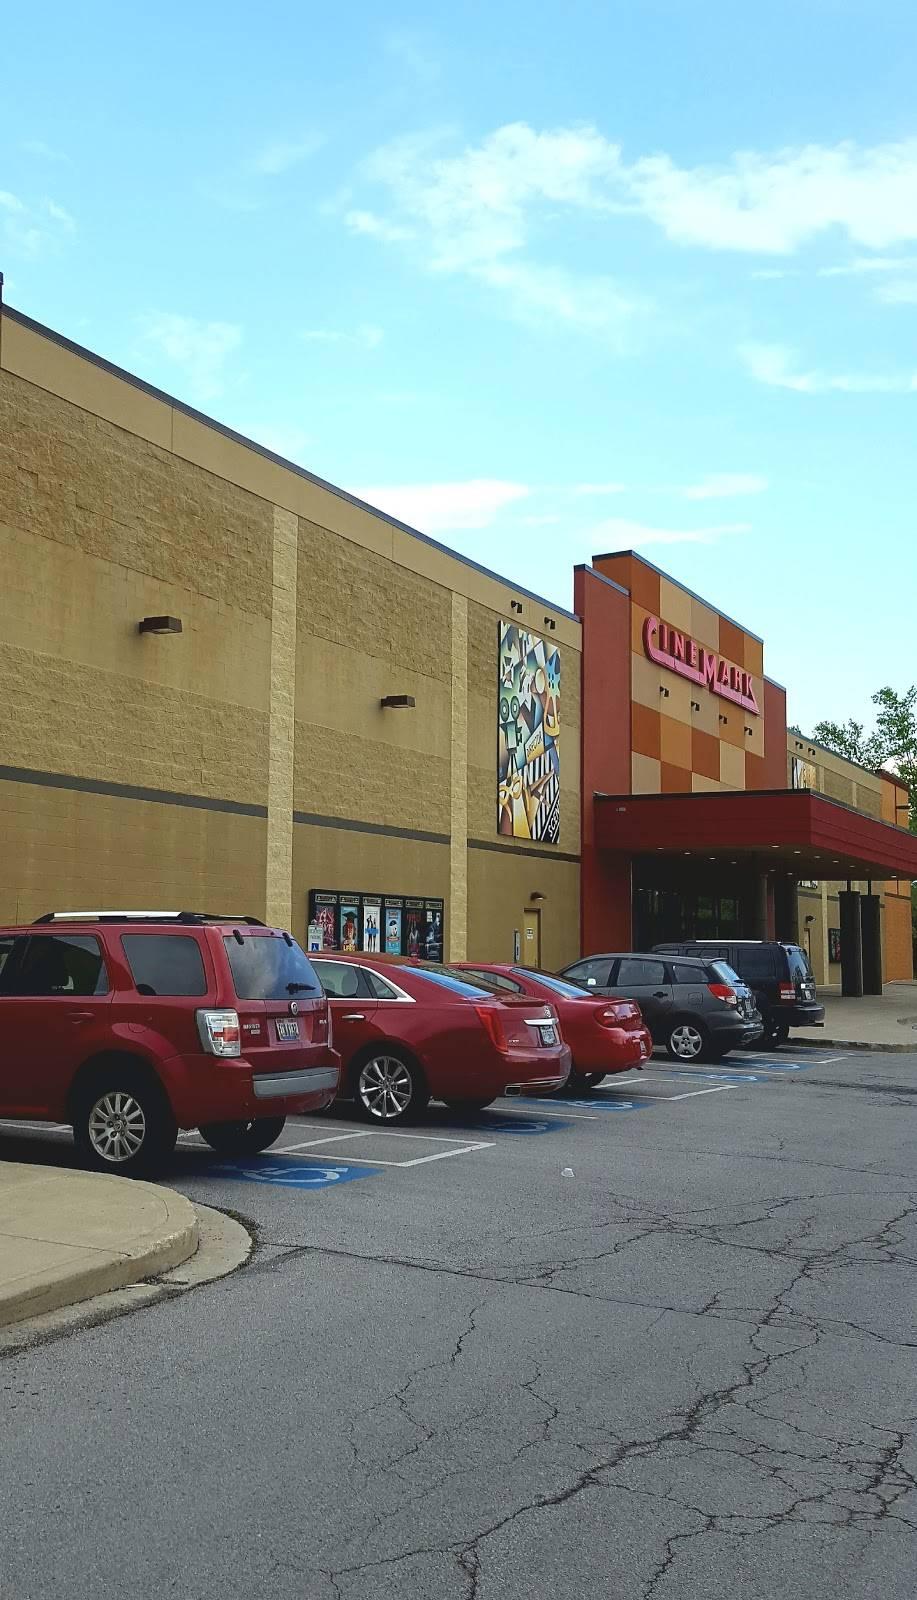 Cinemark Stadium | meal takeaway | 4314 Milan Rd, Sandusky, OH 44870, USA | 4196211380 OR +1 419-621-1380